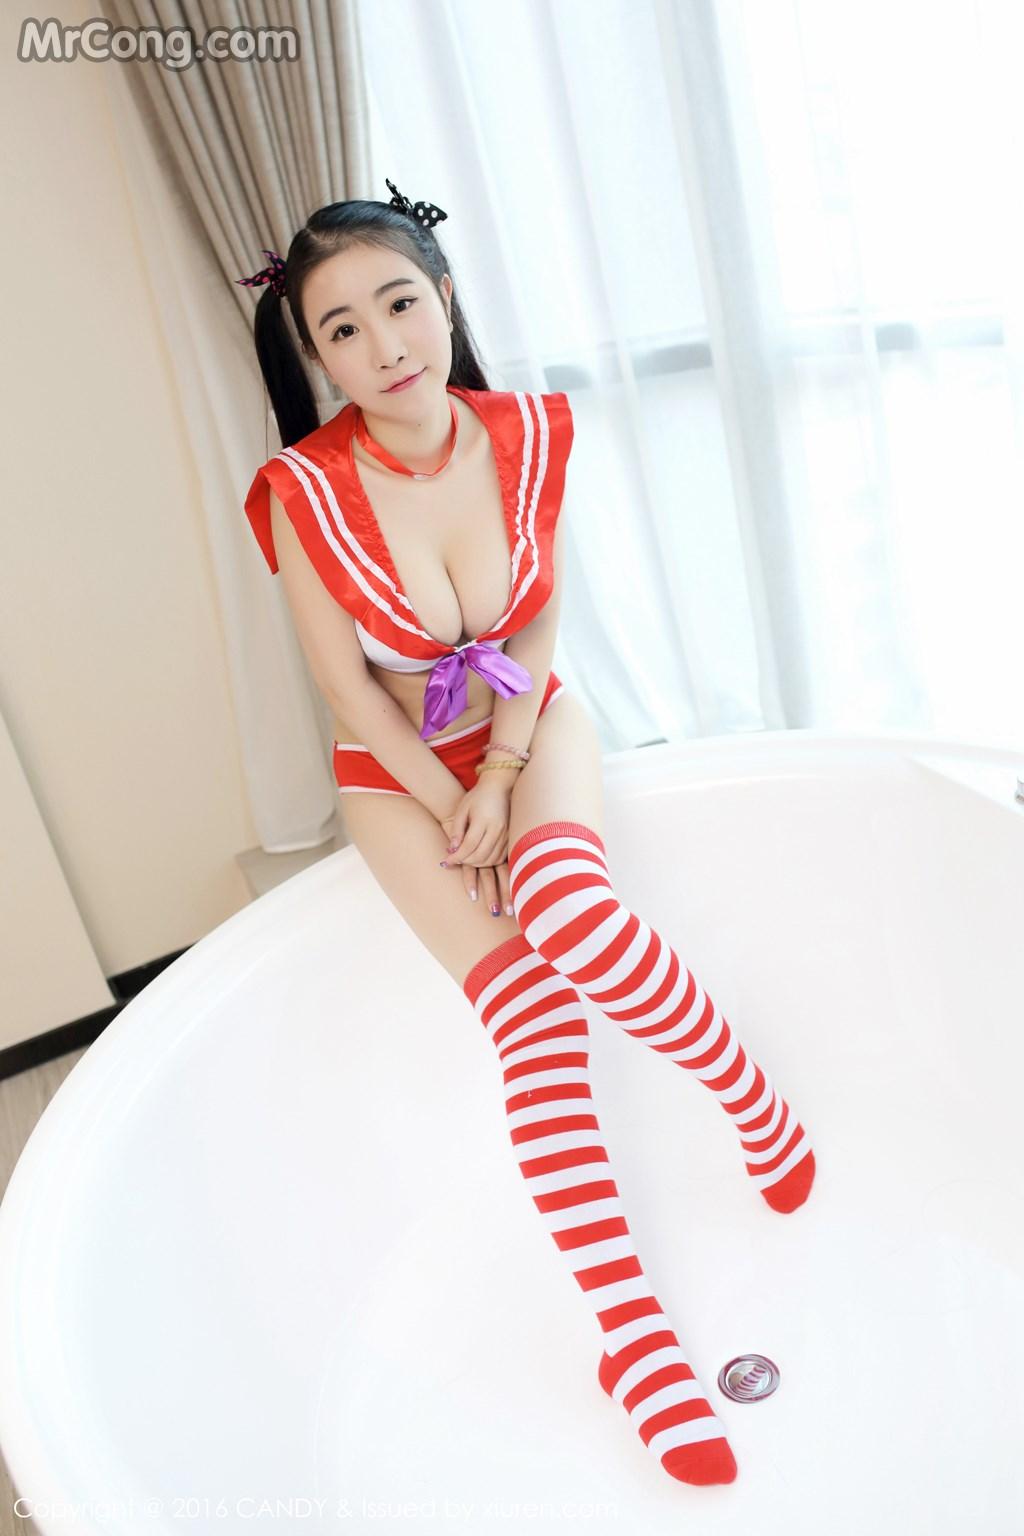 CANDY Vol.002: Model Sindy (谢芷馨) (57 photos)